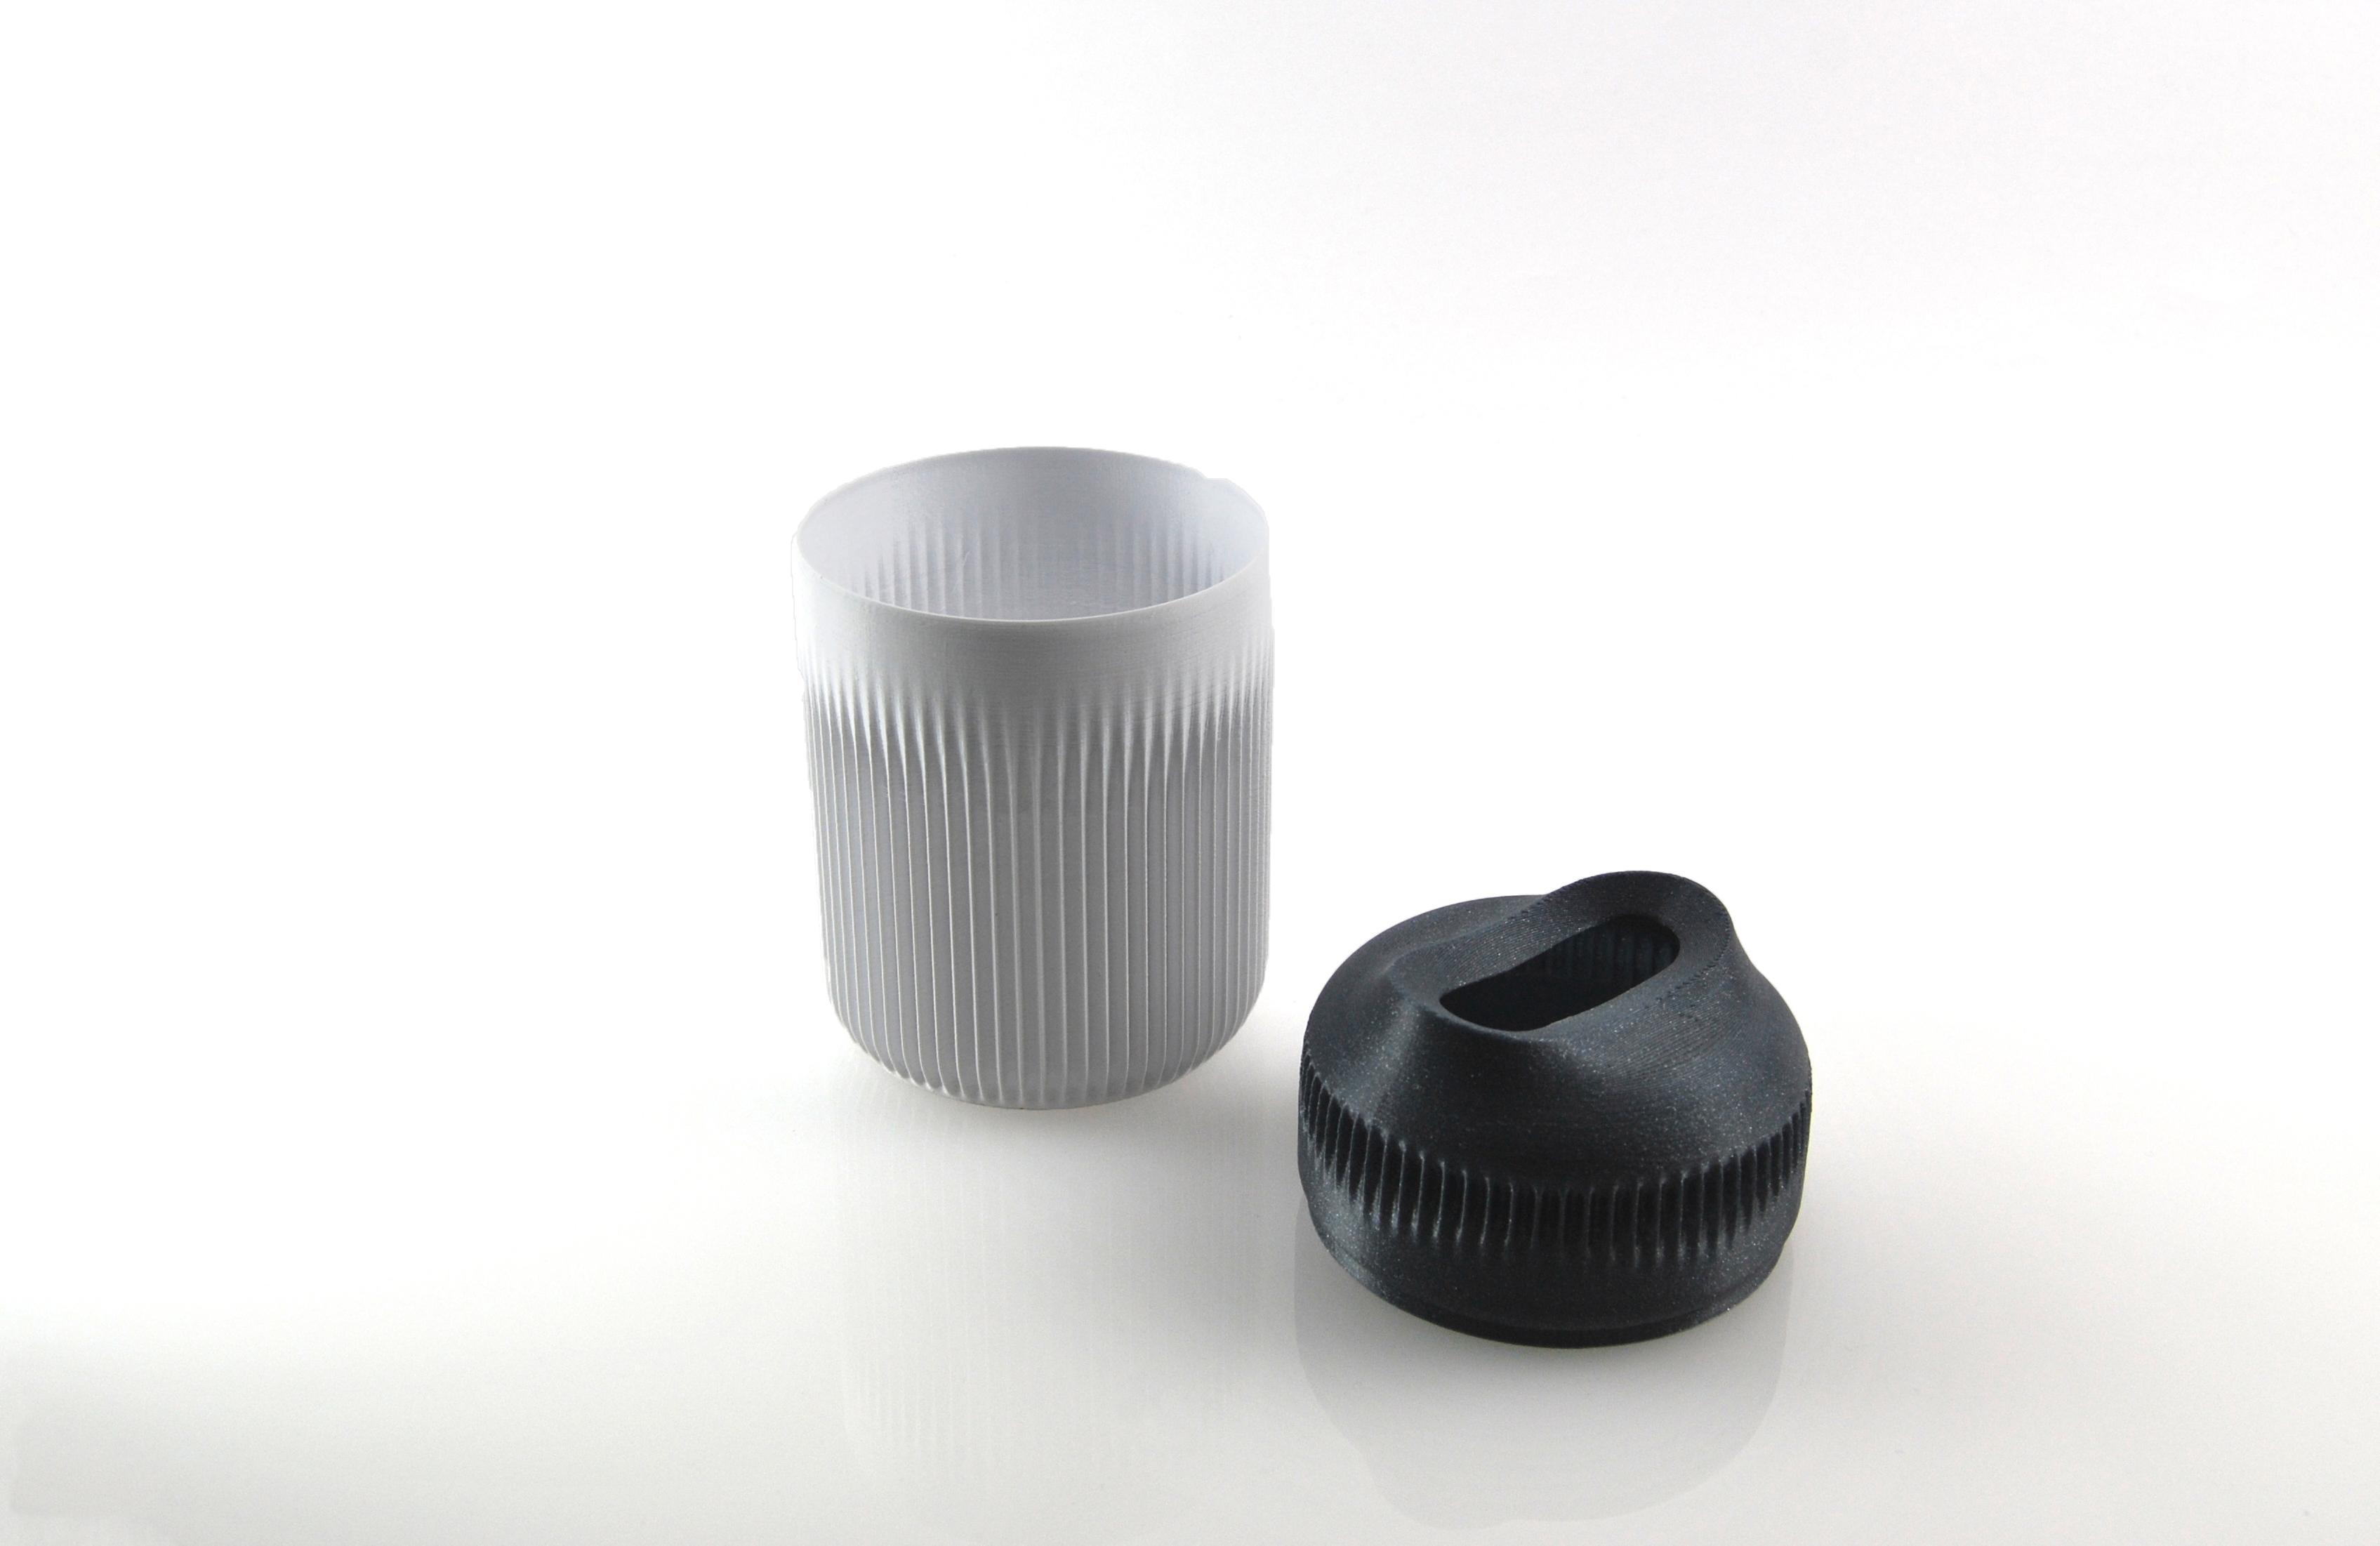 DSC_0036.jpg Download STL file Ambra • 3D printable model, FrancescoRodighiero